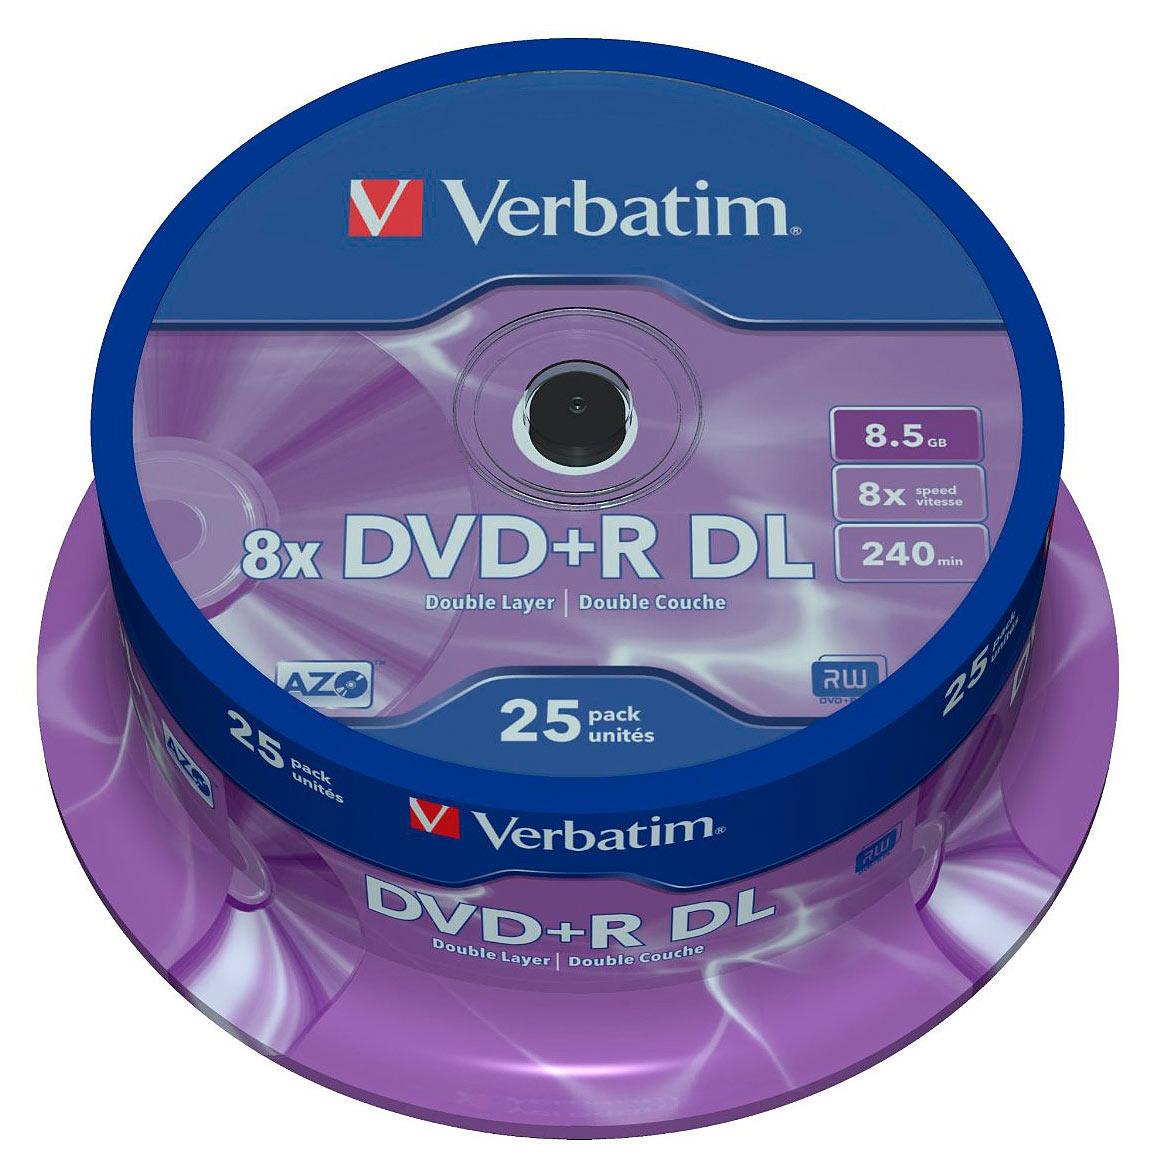 Verbatim DVD+R 8,5GB, 8x Double Layer printable, 25er-Spindel